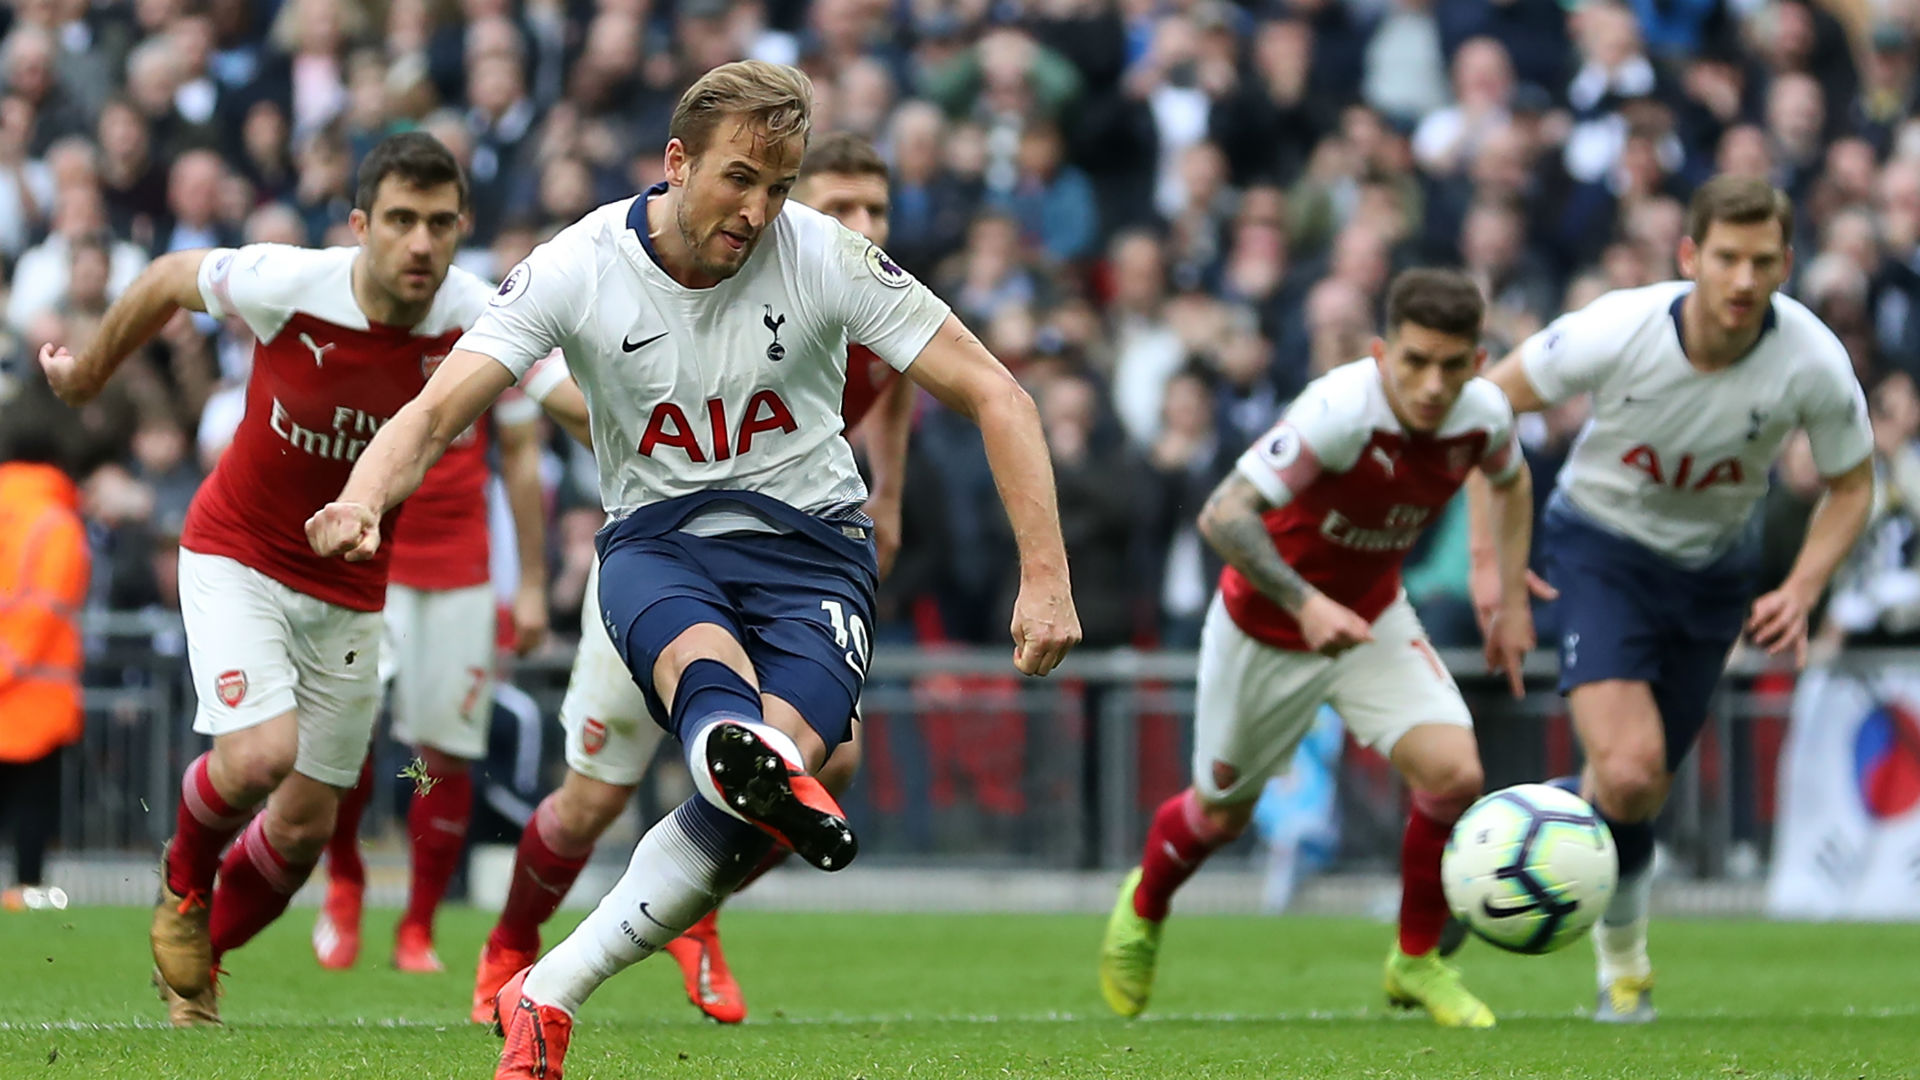 Dipenuhi 2 Penalti dan Kartu Merah, Arsenal Telah Gagal BungkamTottenham